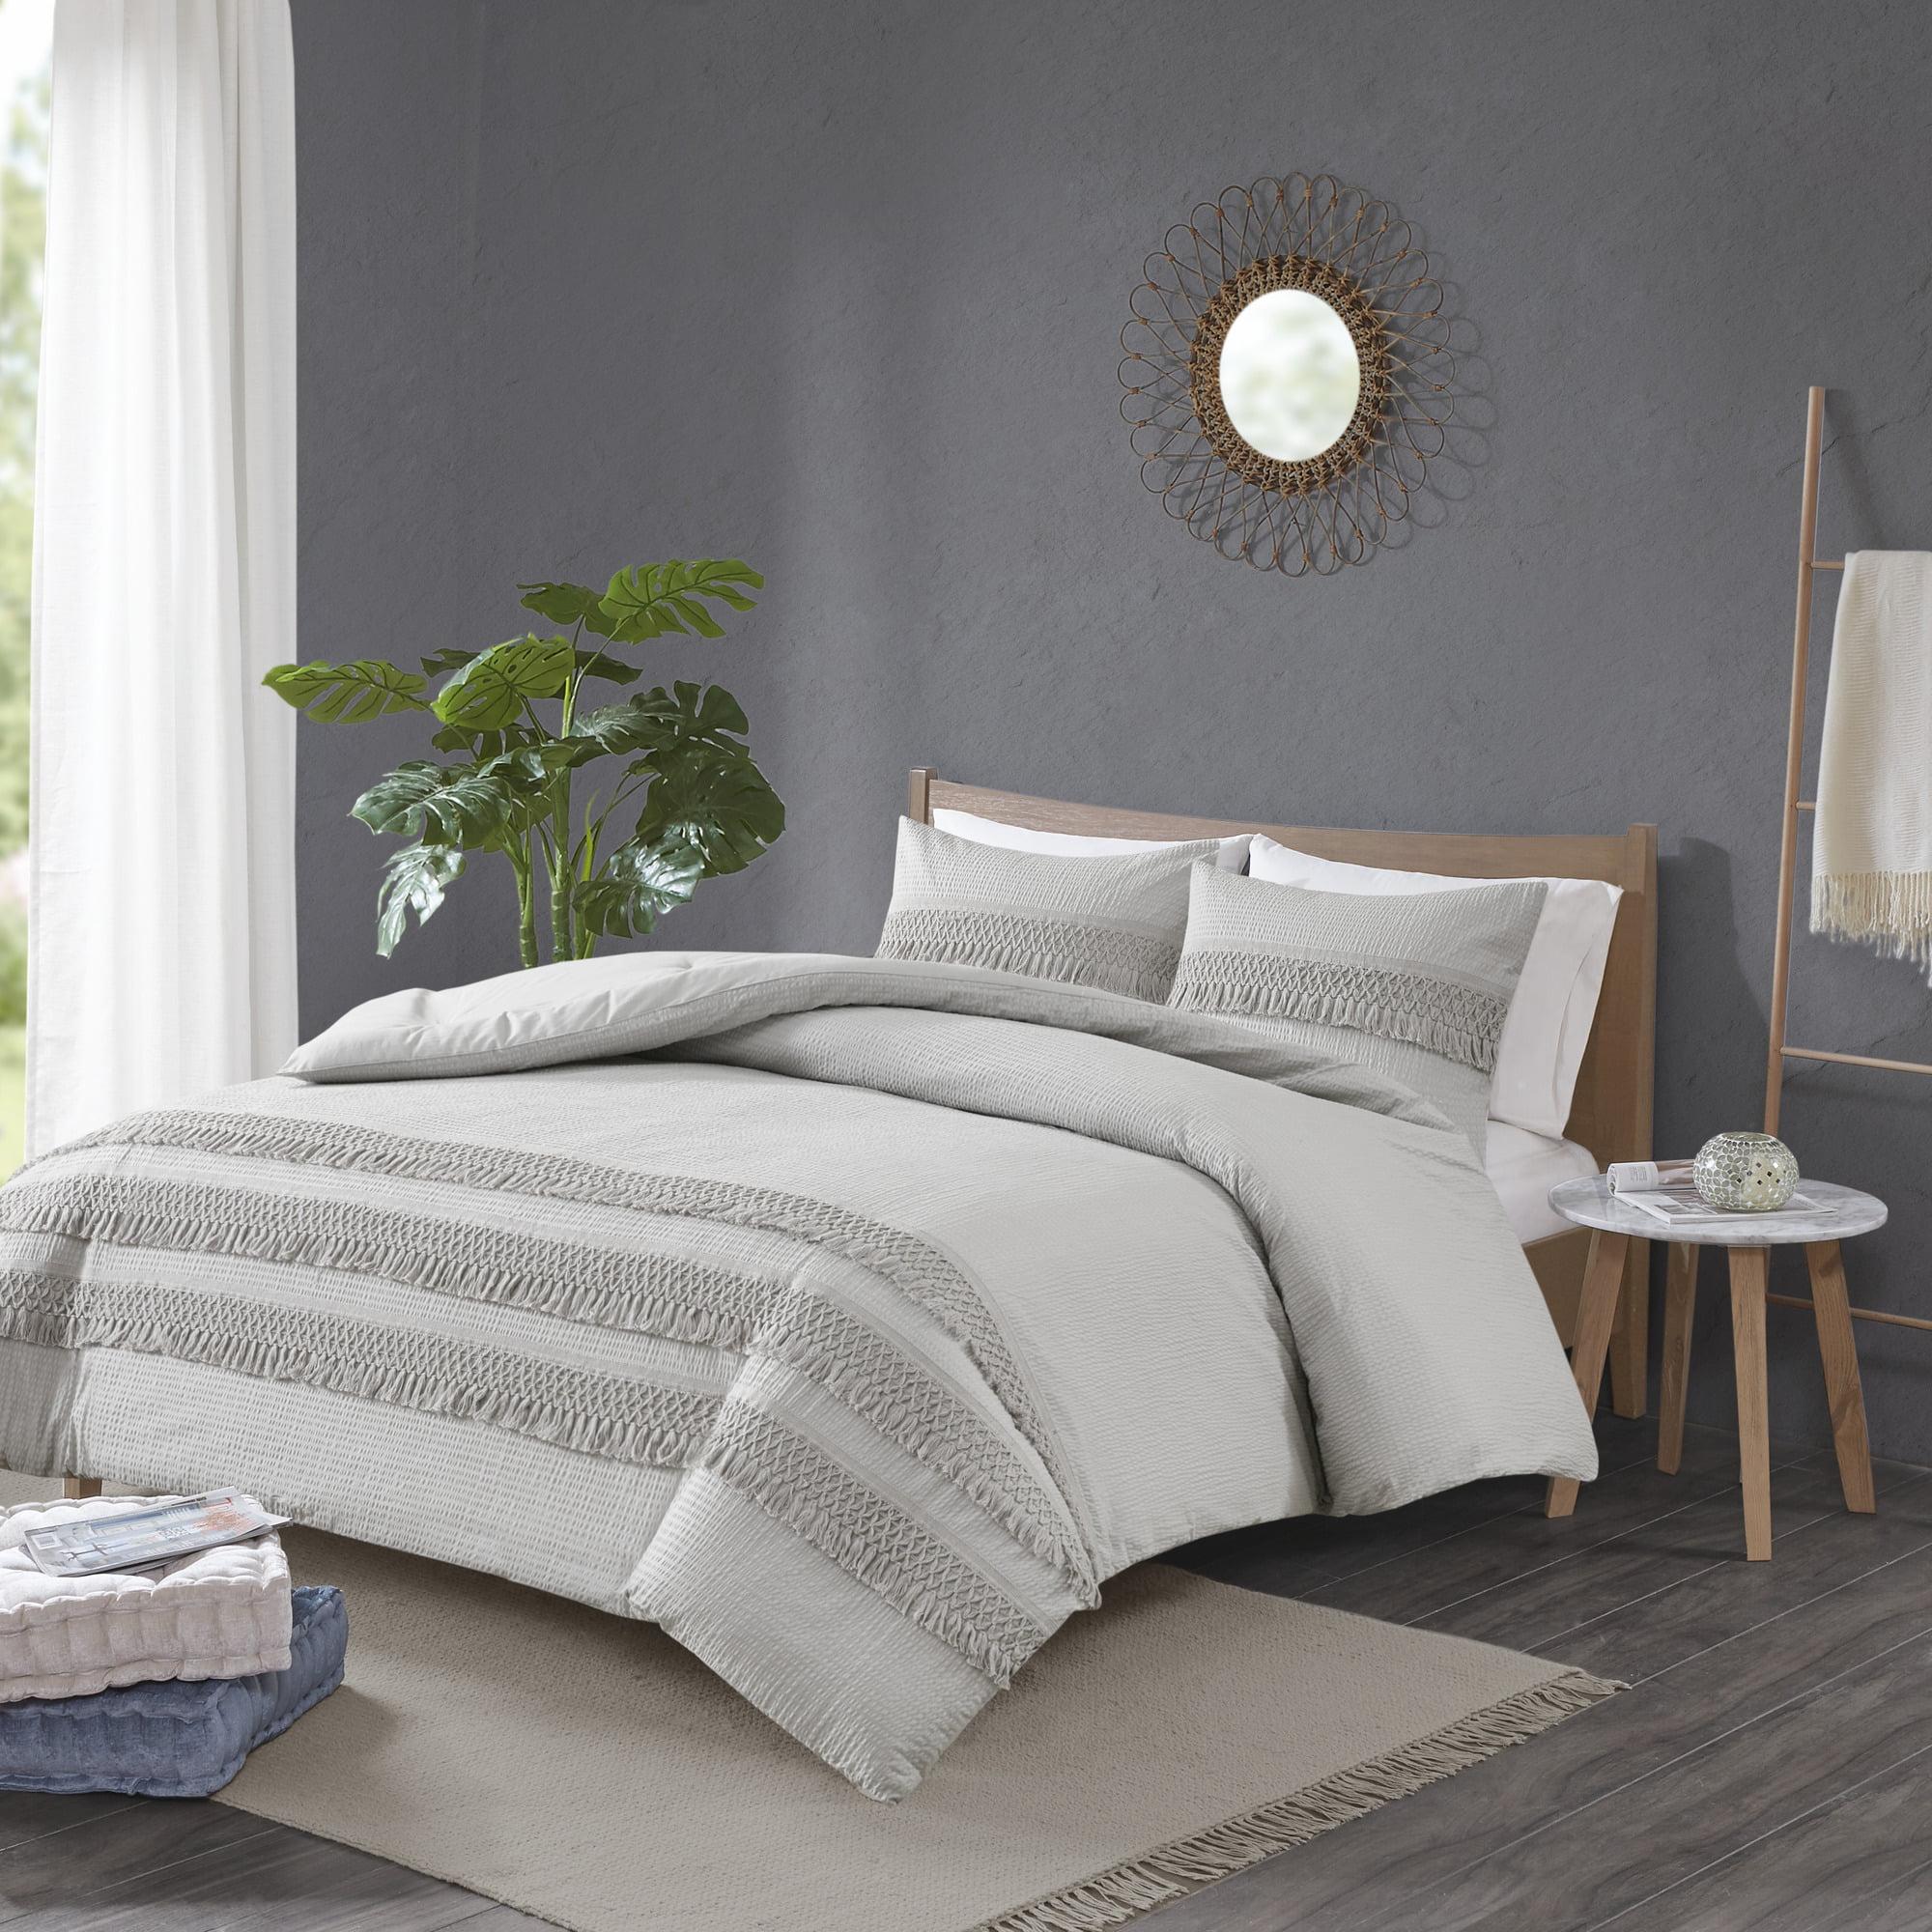 SeerSucker Duvet Quilt Cover Pillowcase Bedding Set Polly Cotton Stripe Bed Sets